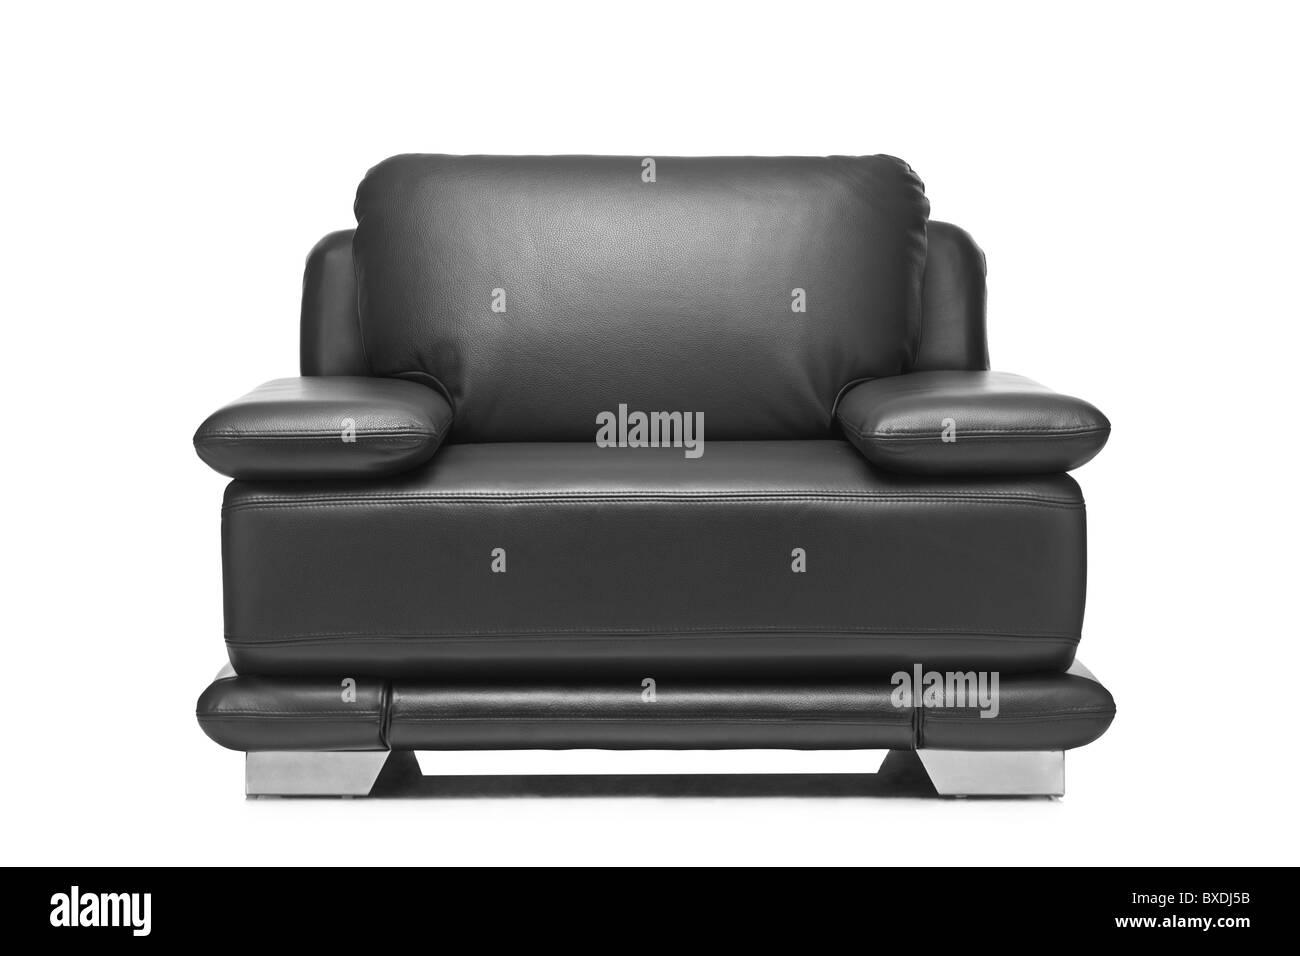 a studio shot of a leather black armchair BXDJ5B